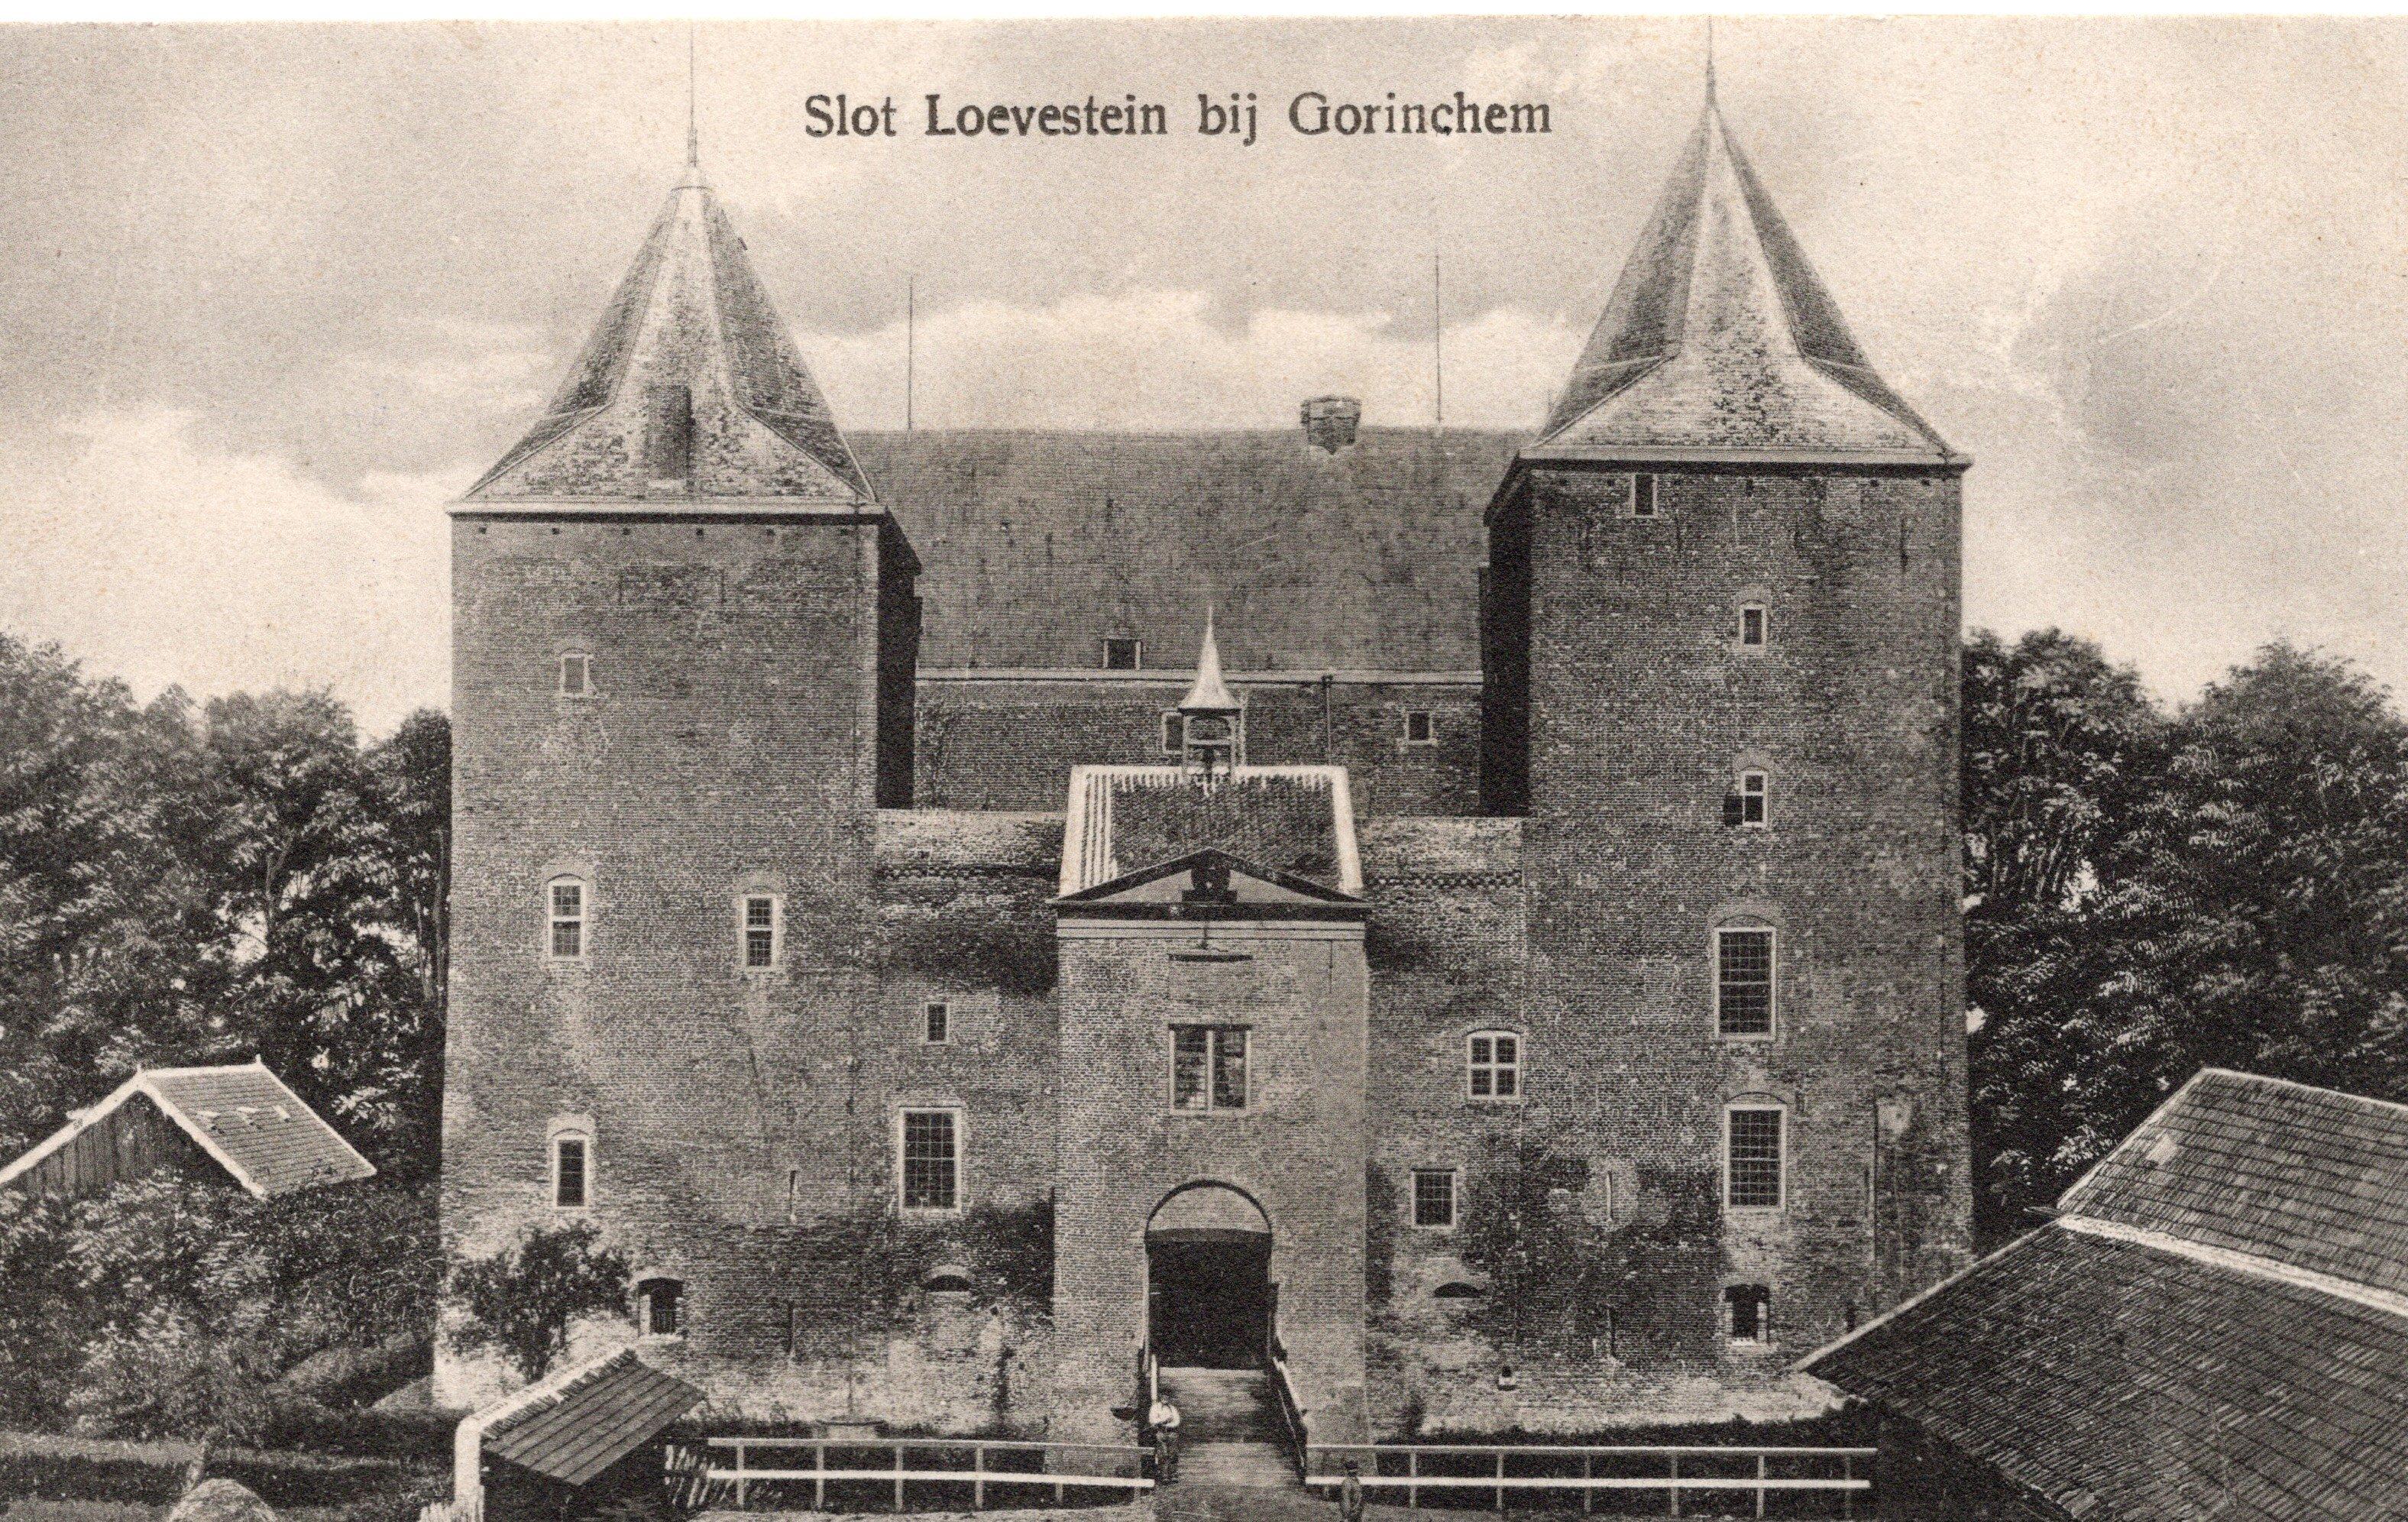 B3-Slot-Loevestein-bij-Gorinchem-1924